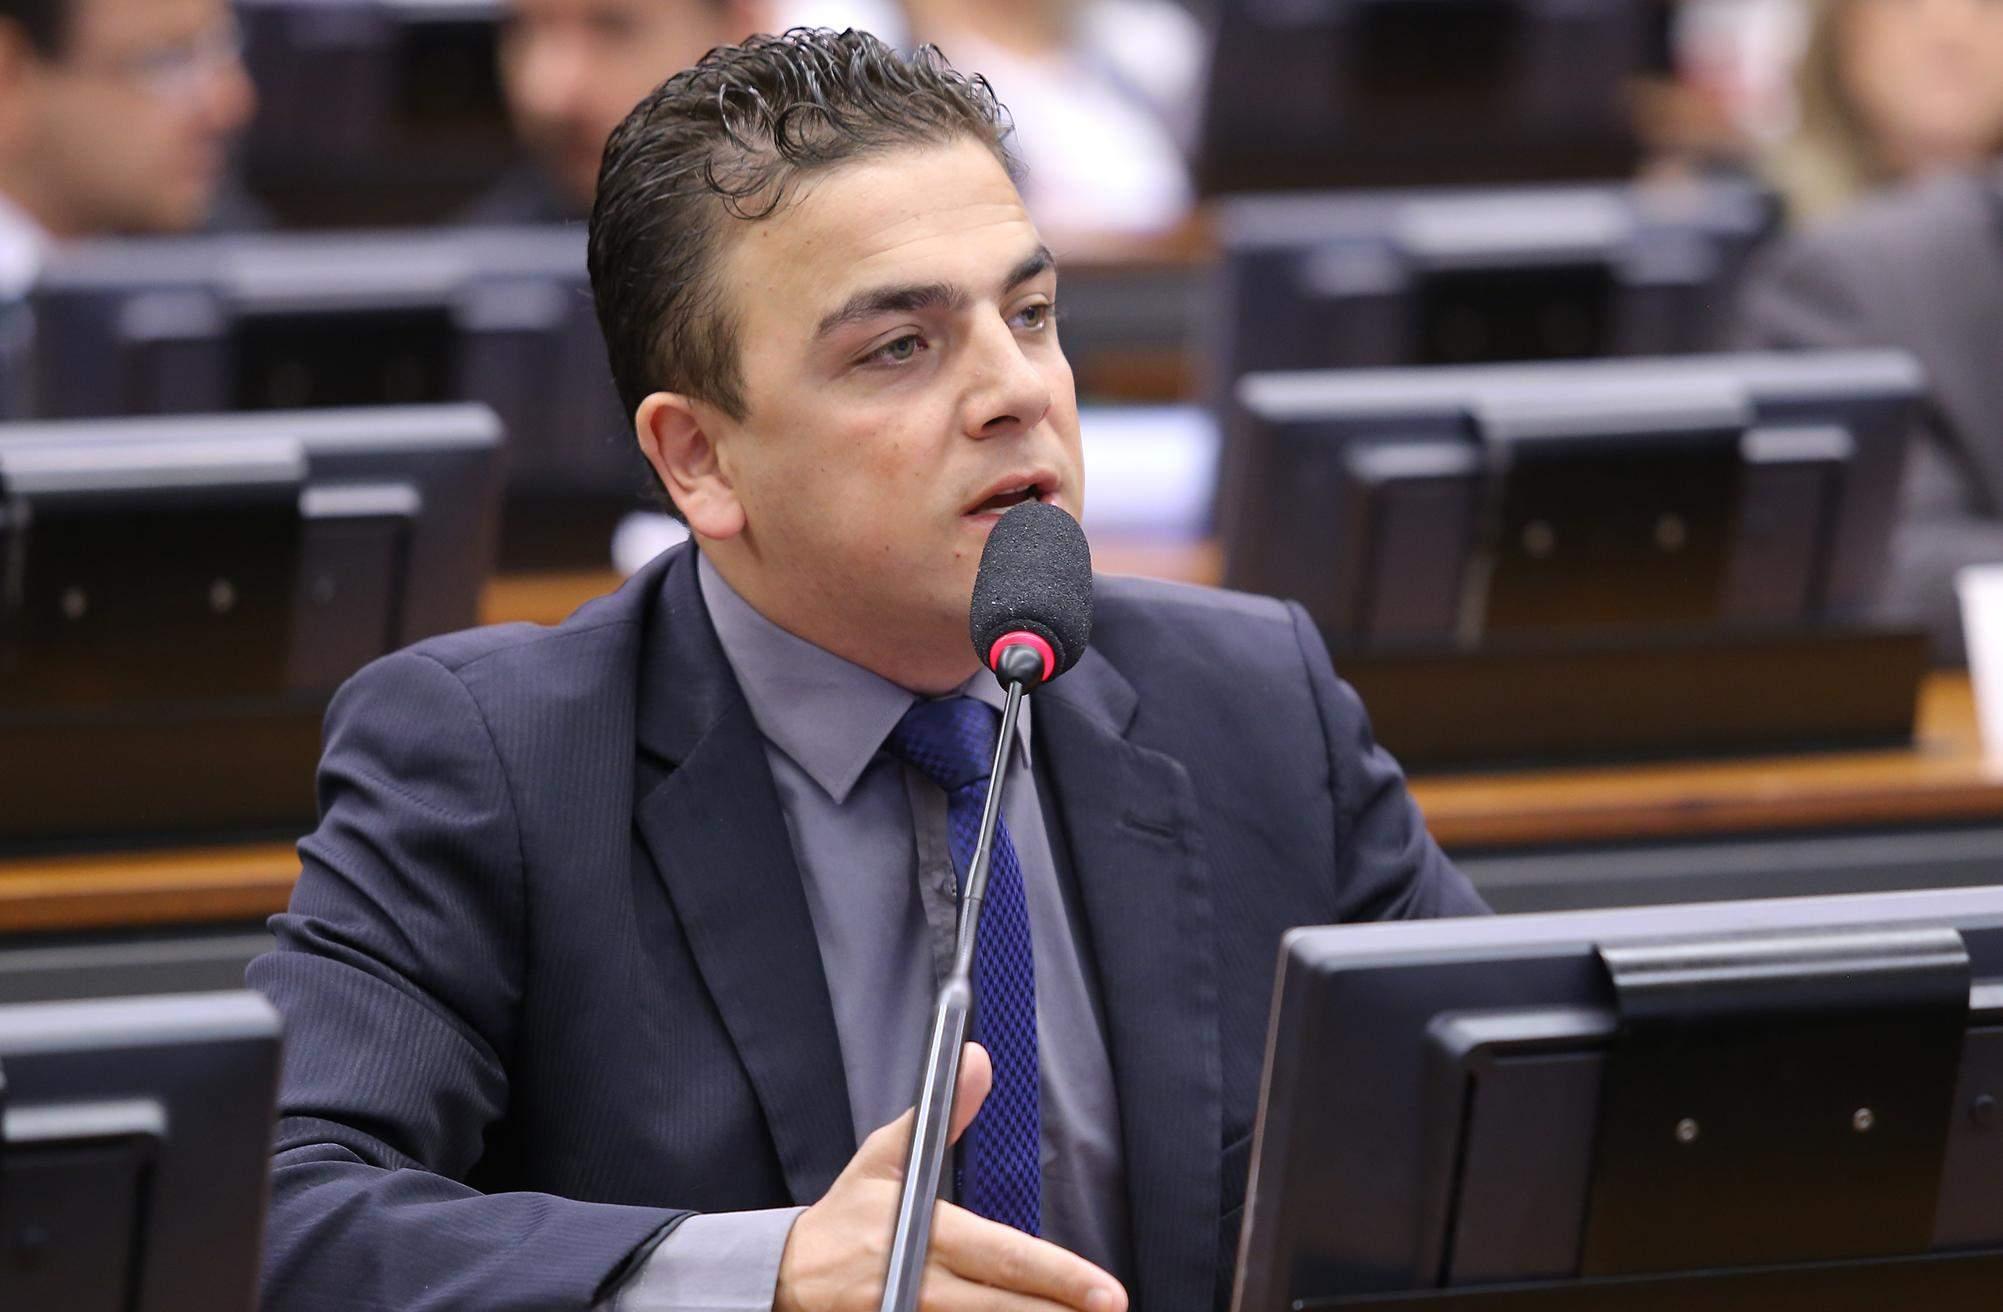 IMAGEM: Aliel Machado, do PSB, vai presidir comissão da prisão na 2ª instância